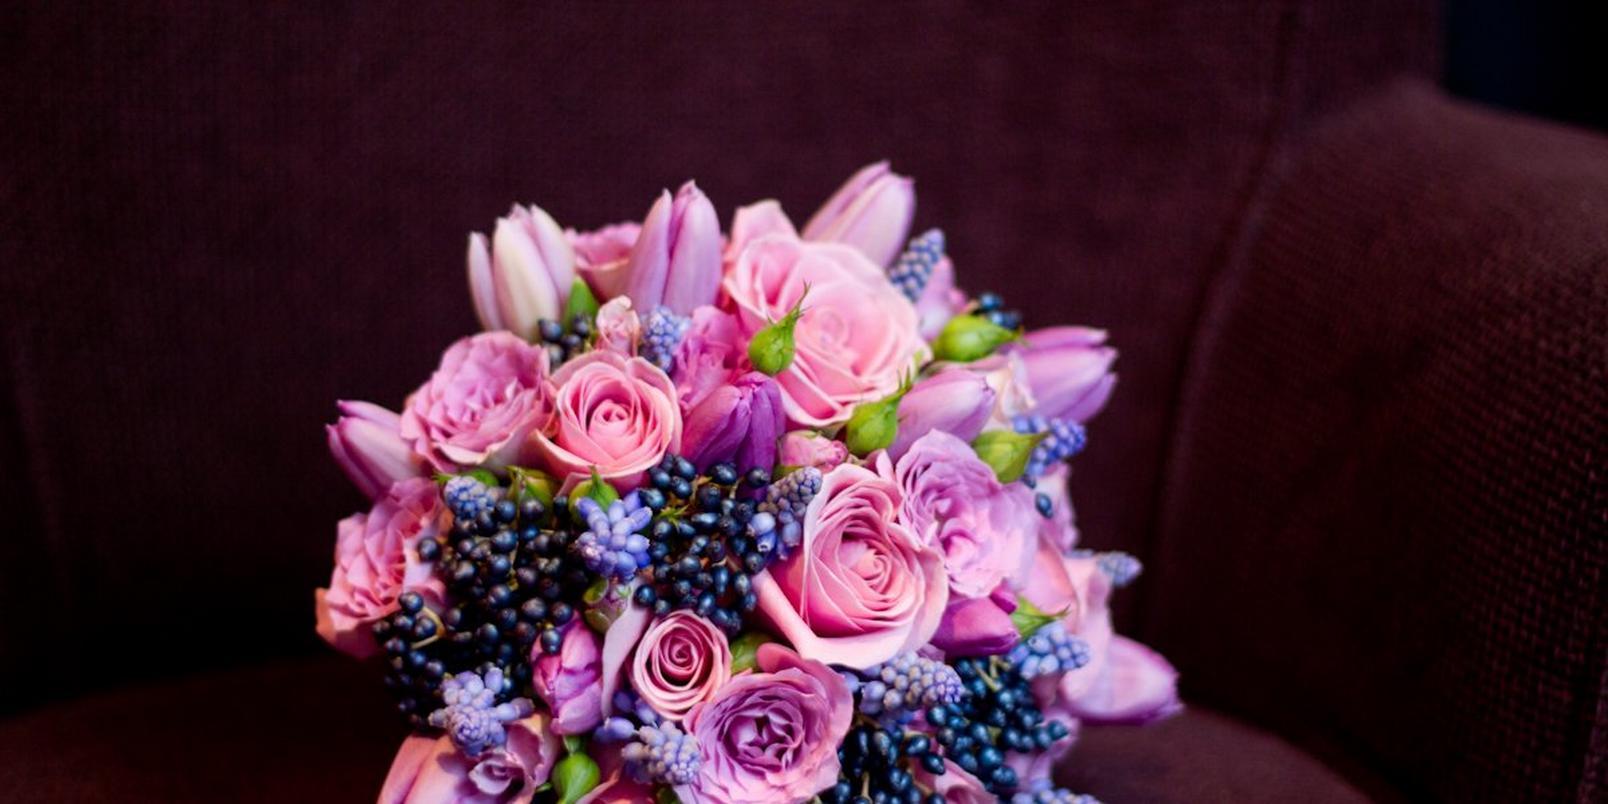 6-wedding-ideas-for-the-autumn-bride-3